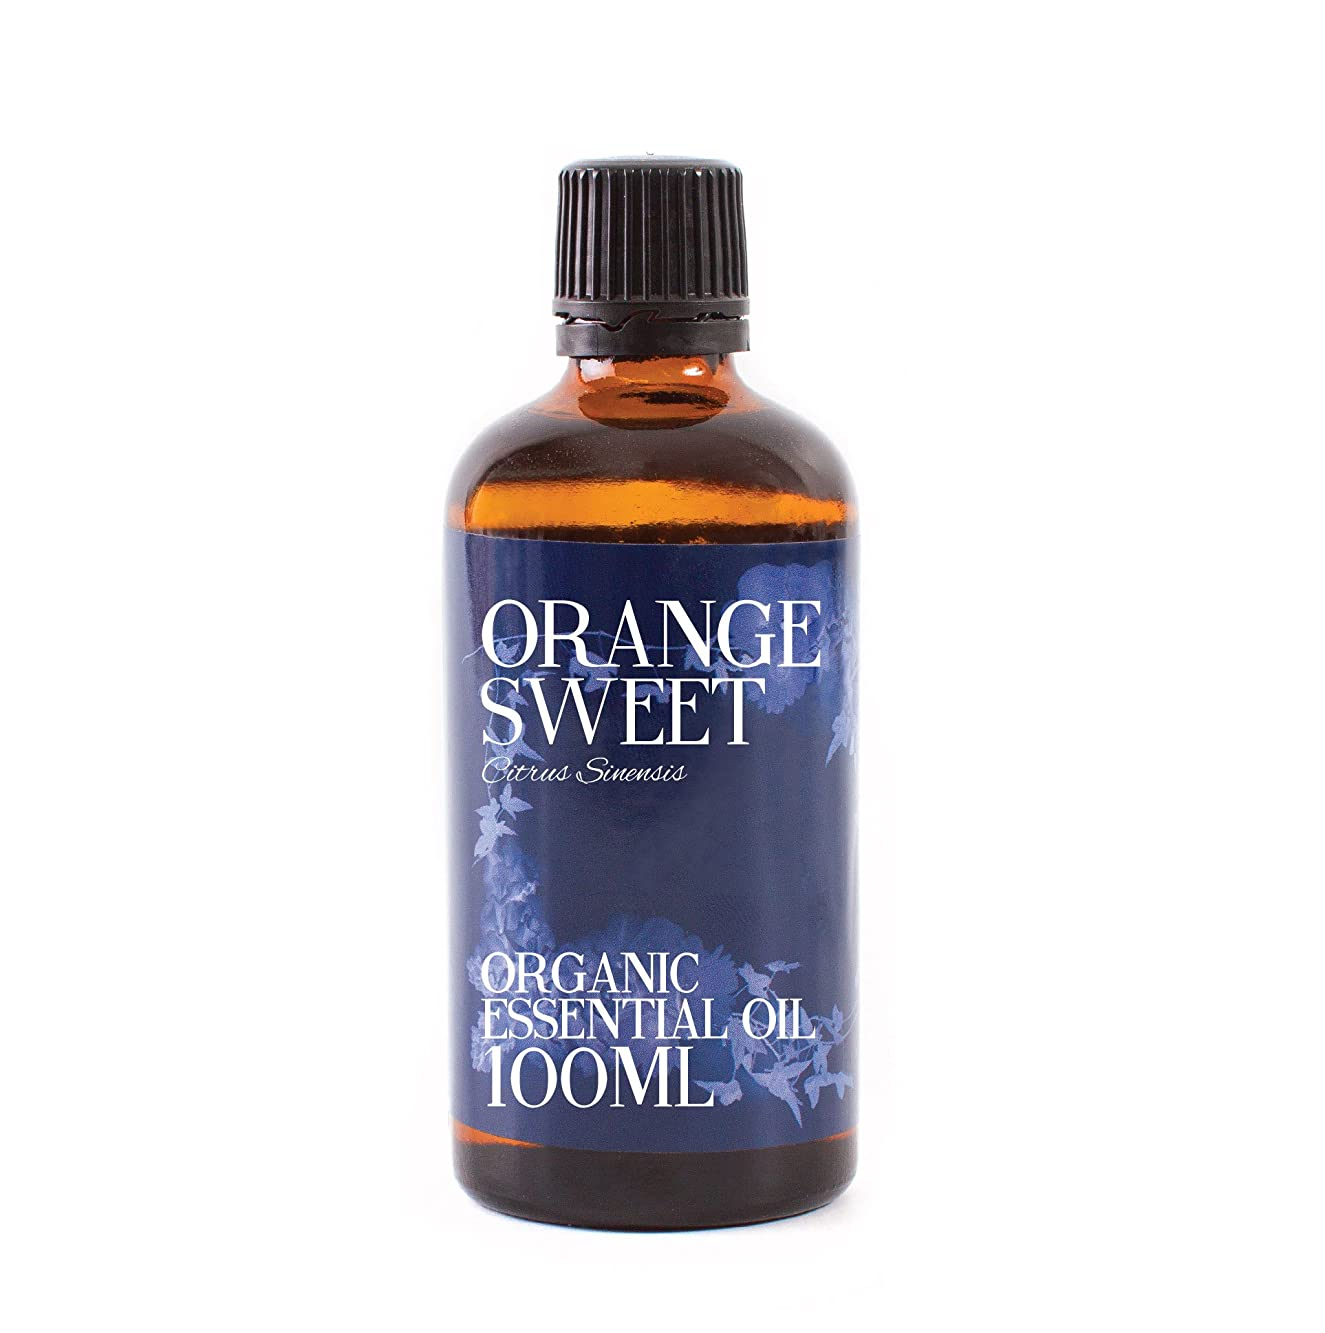 屋内交差点革命的Mystic Moments | Orange Sweet Organic Essential Oil - 100ml - 100% Pure